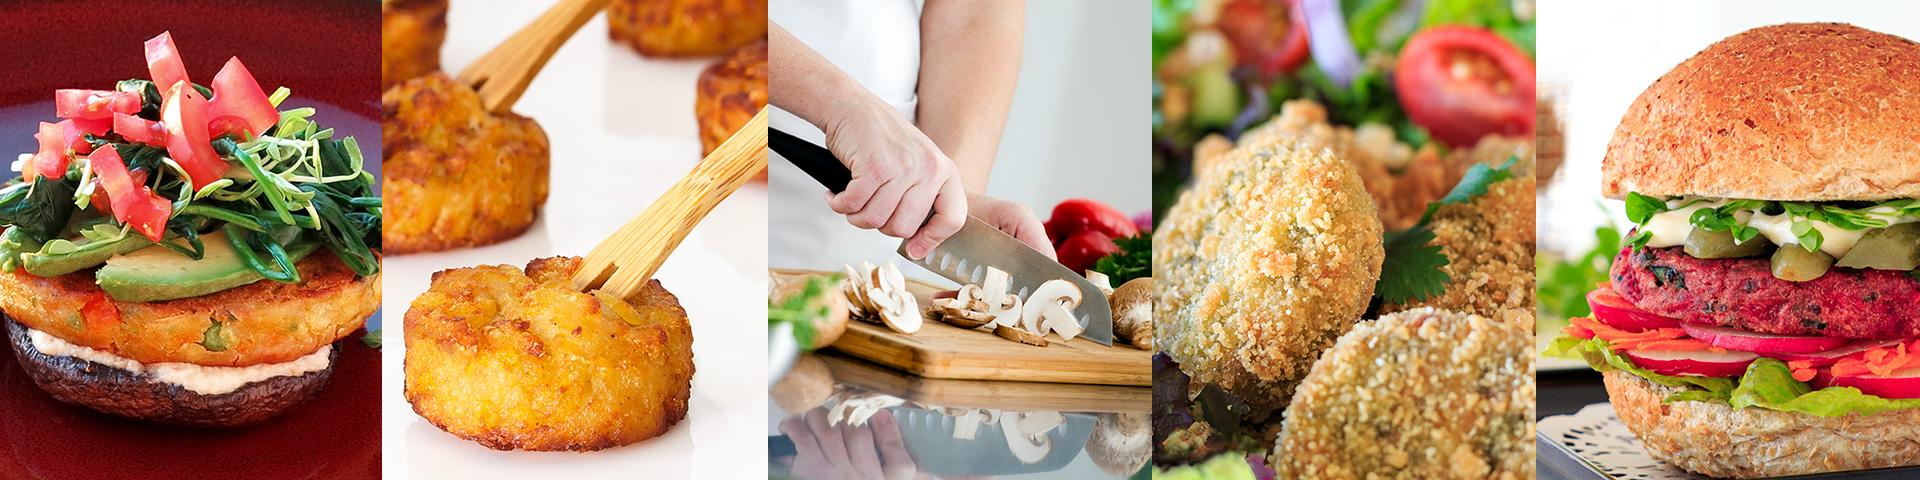 Birubi Foods Vegie Magic Branded Products